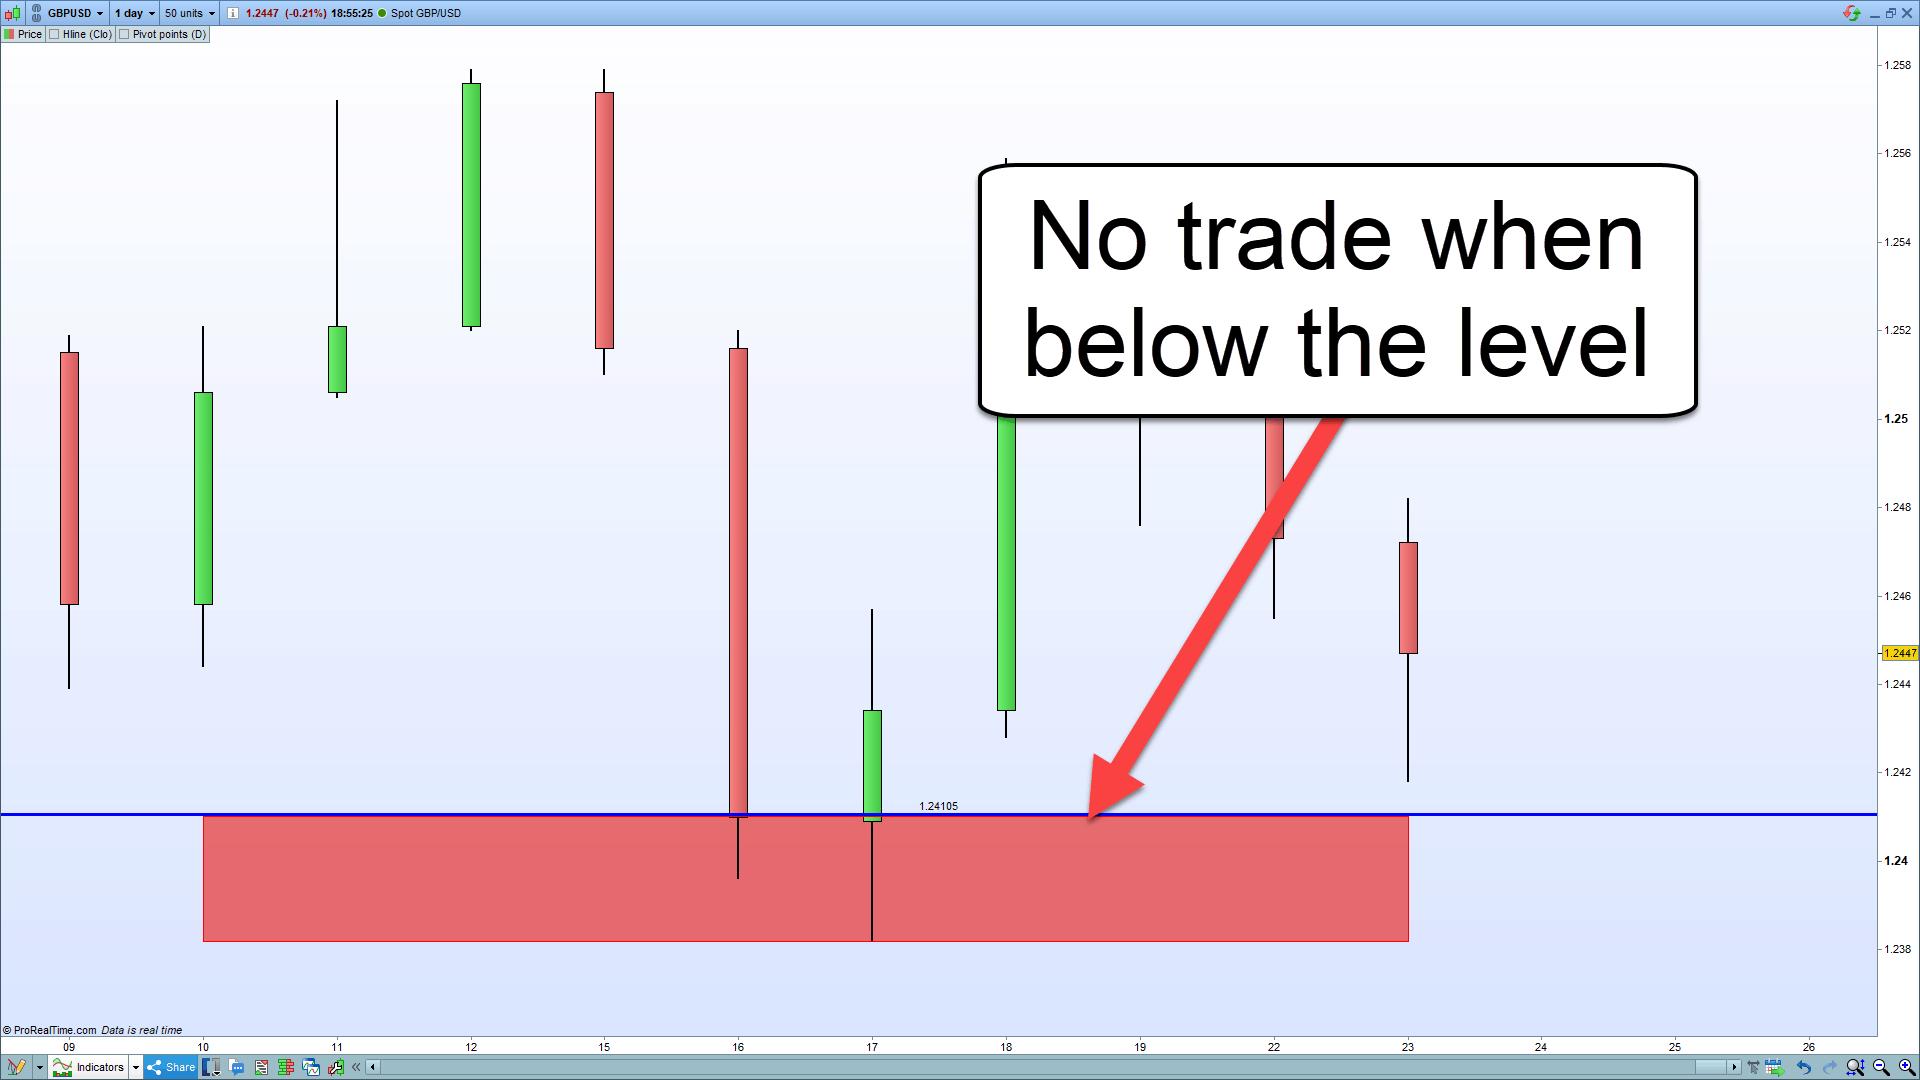 No trade below